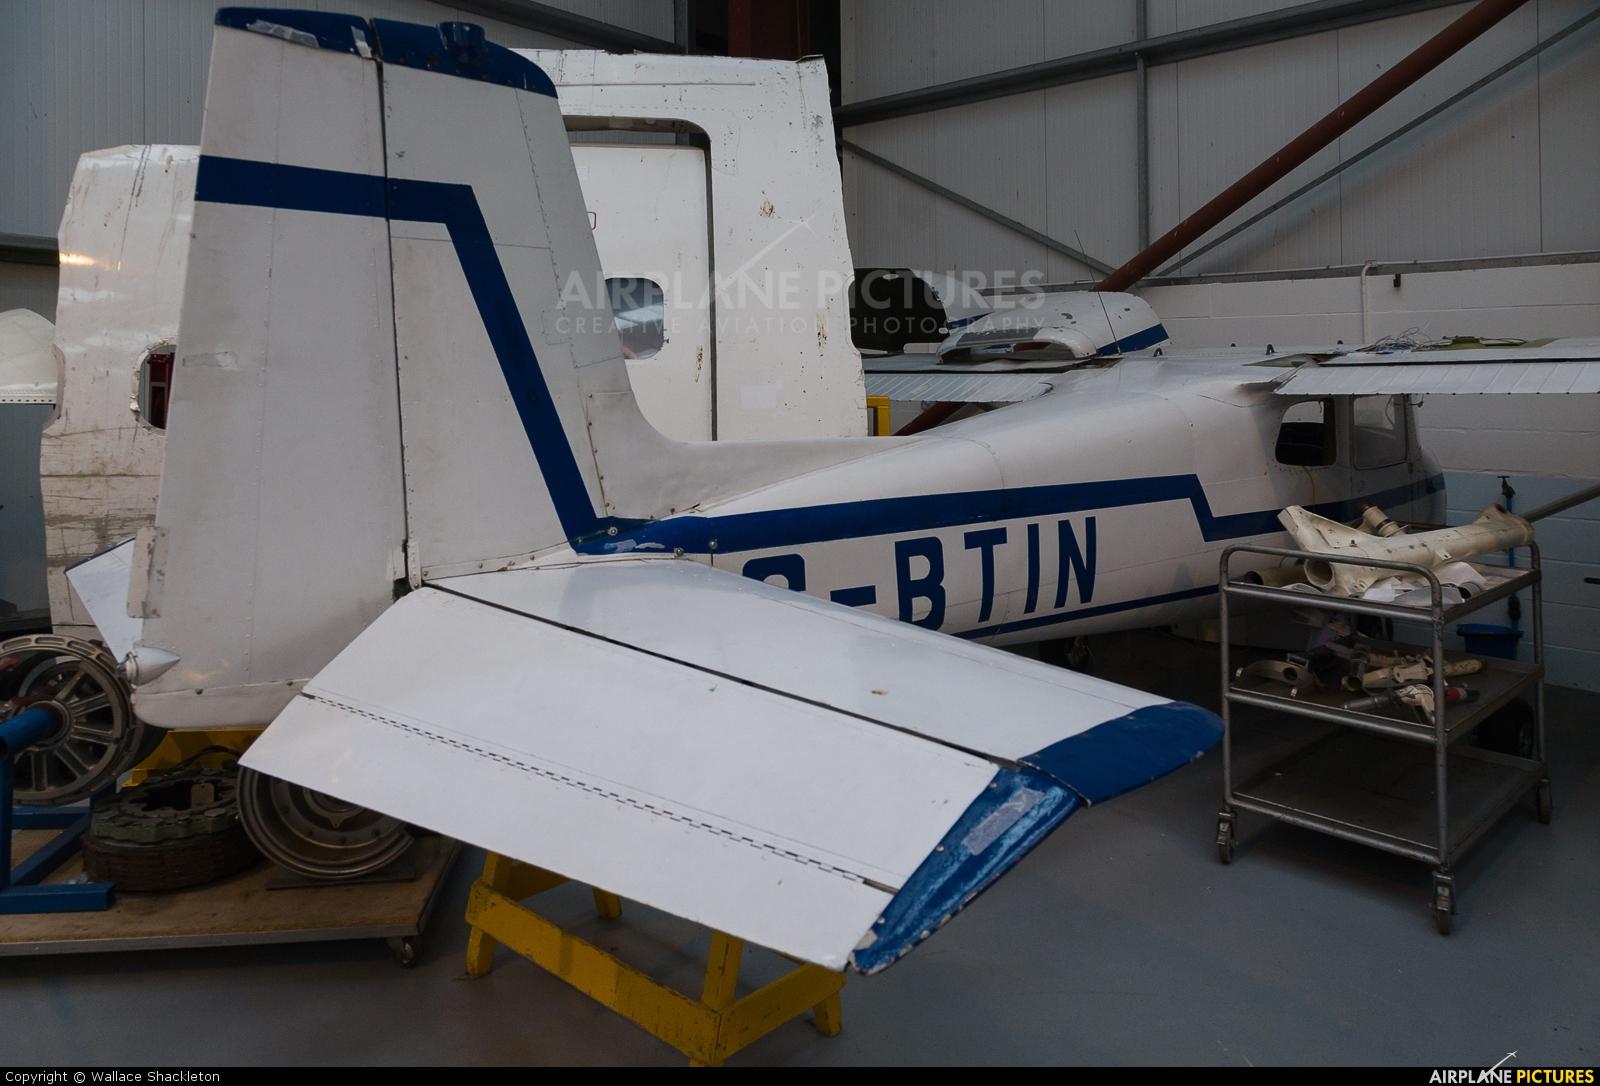 Air Service Training G-BTIN aircraft at Perth - Scone